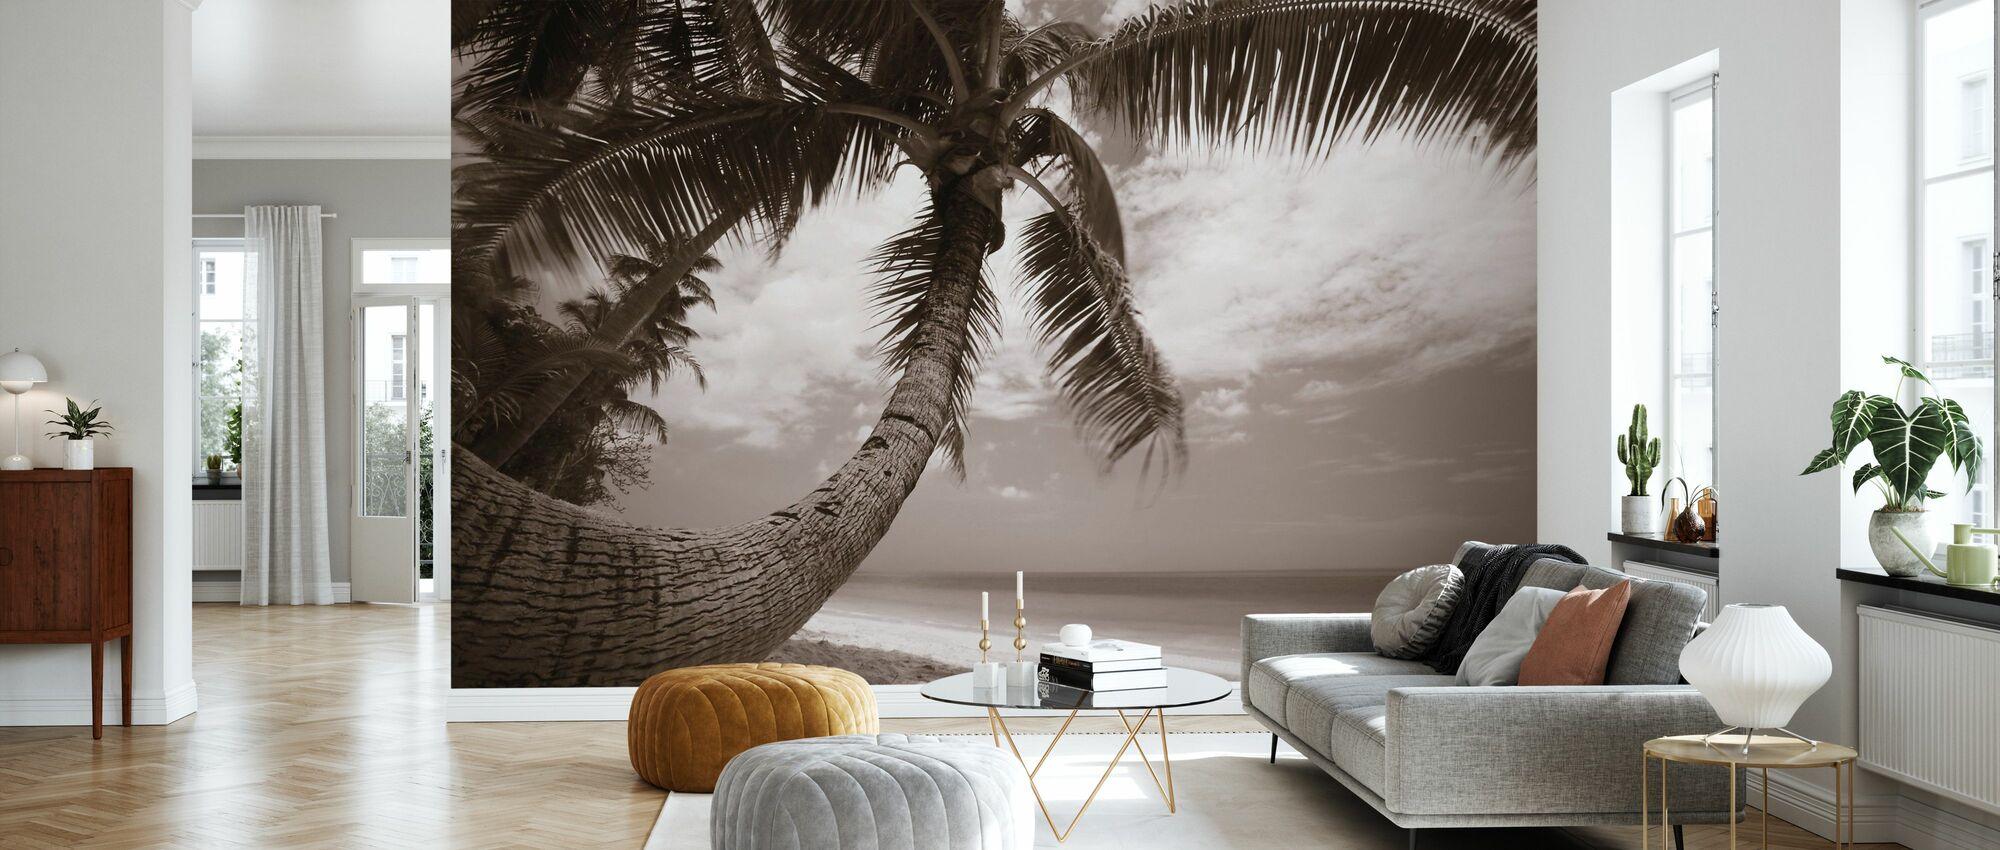 Ronde vorm Palm - Sepia - Behang - Woonkamer